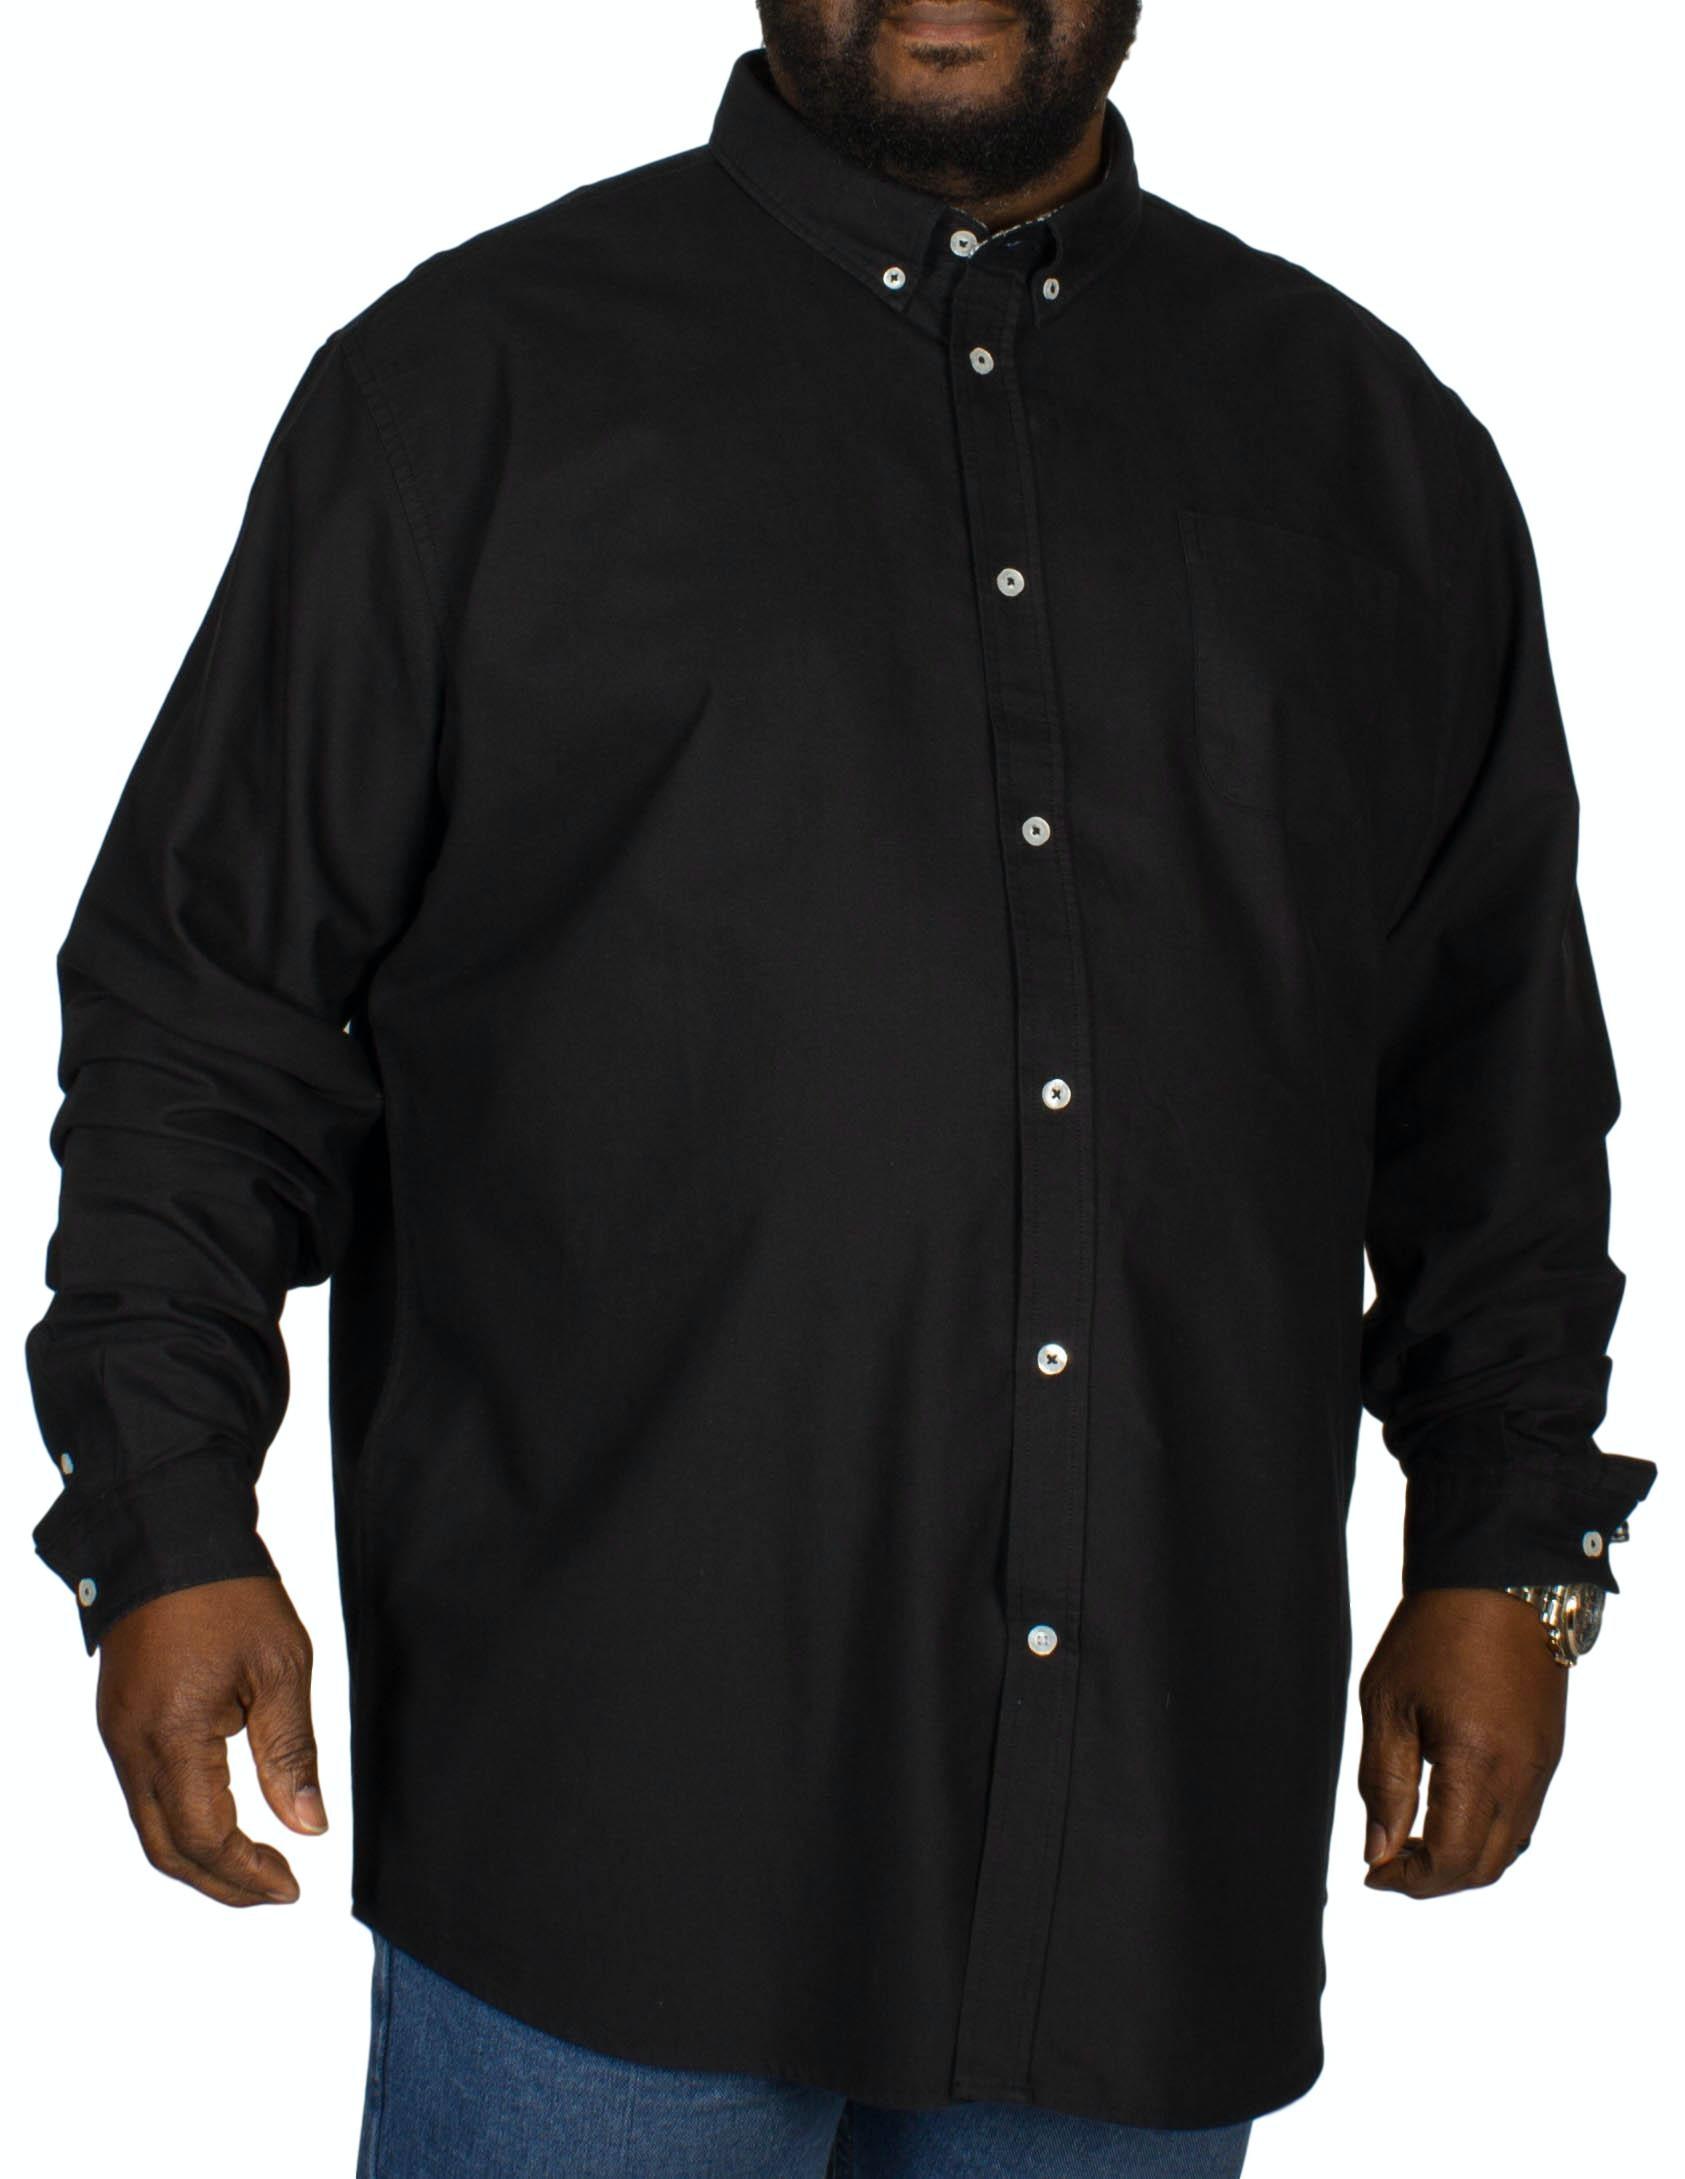 D555 Keenan Oxford Shirt Black